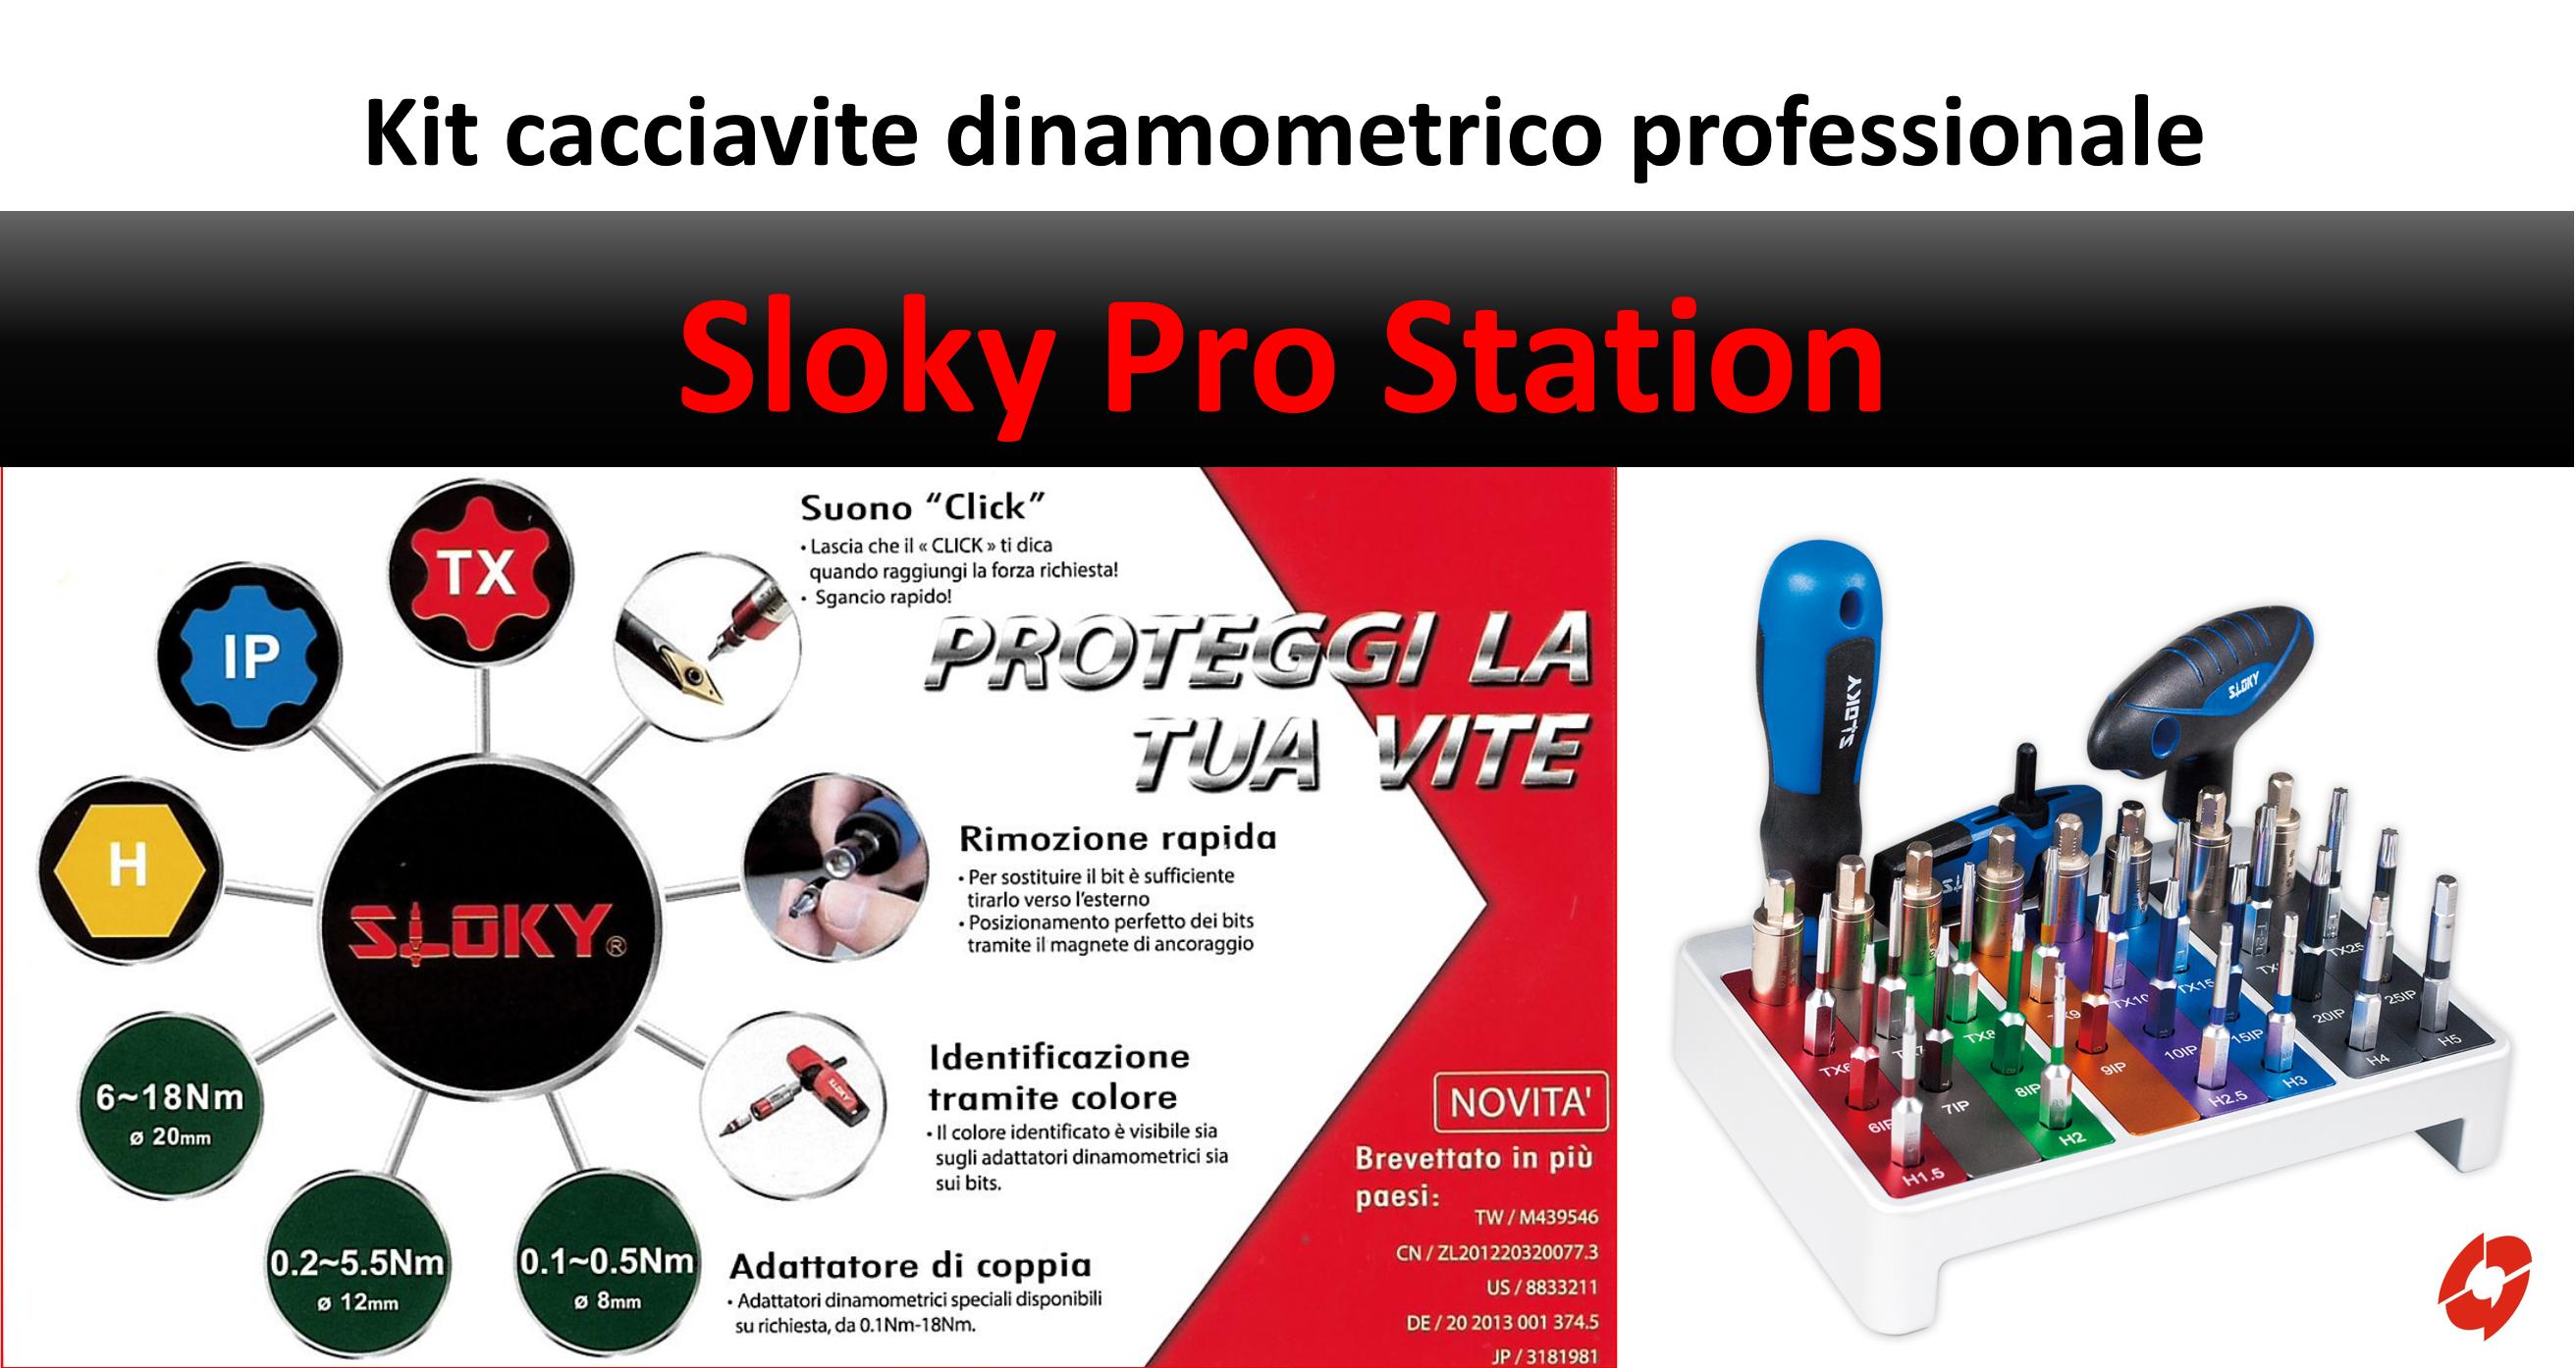 Sloky Pro Station kit cacciaviti dinamometrici professionali